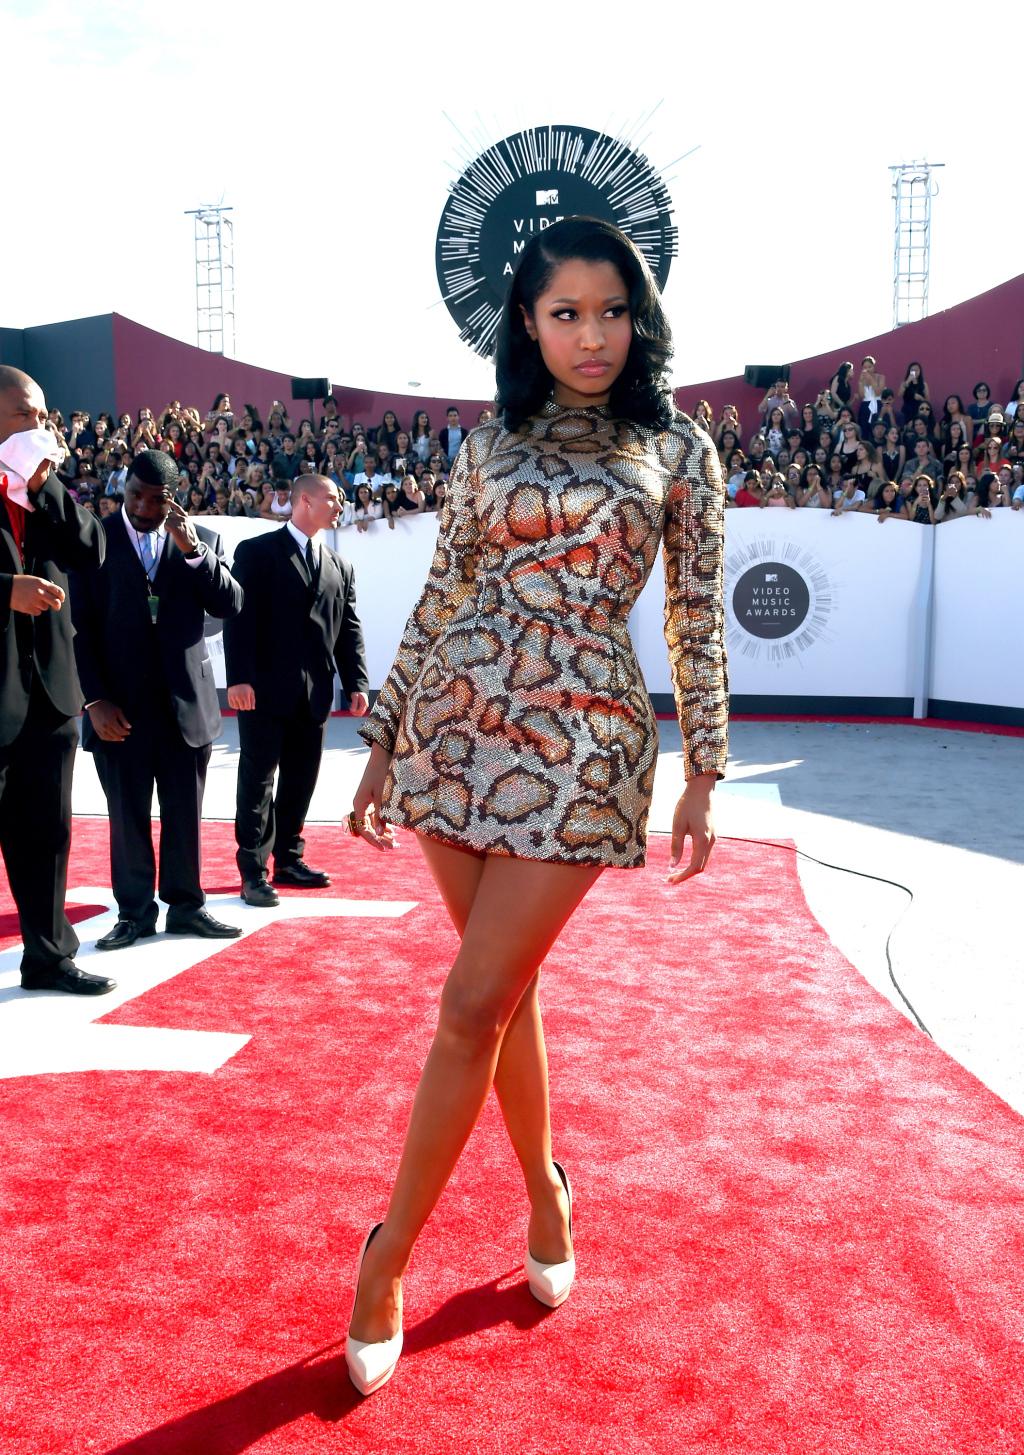 Nicki Minaj - 2014 MTV Video Music Awards (Foto: Reprodução)